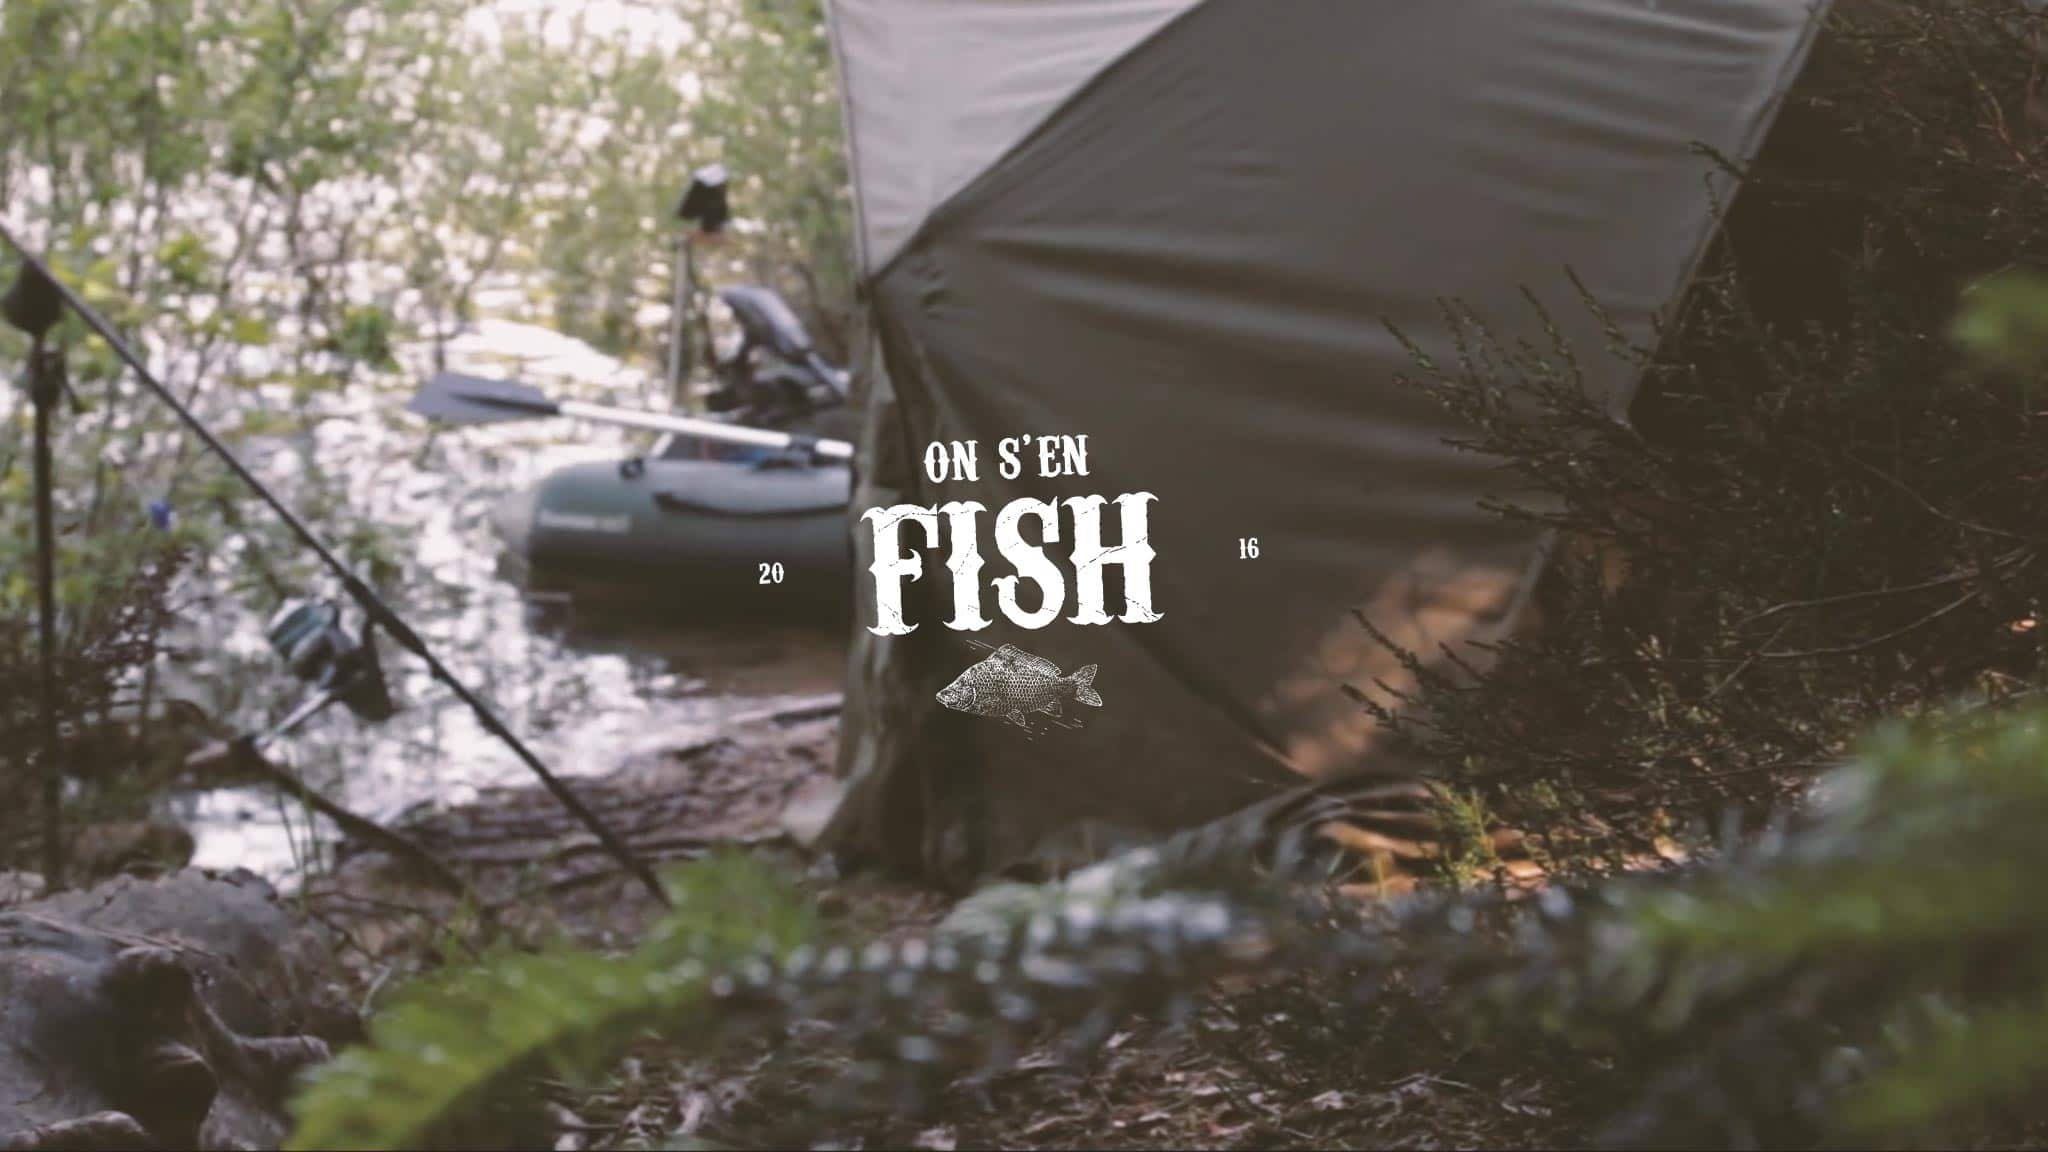 on-s-en-fish-galerie-article-peche-carpe-forum-montlucon-2018